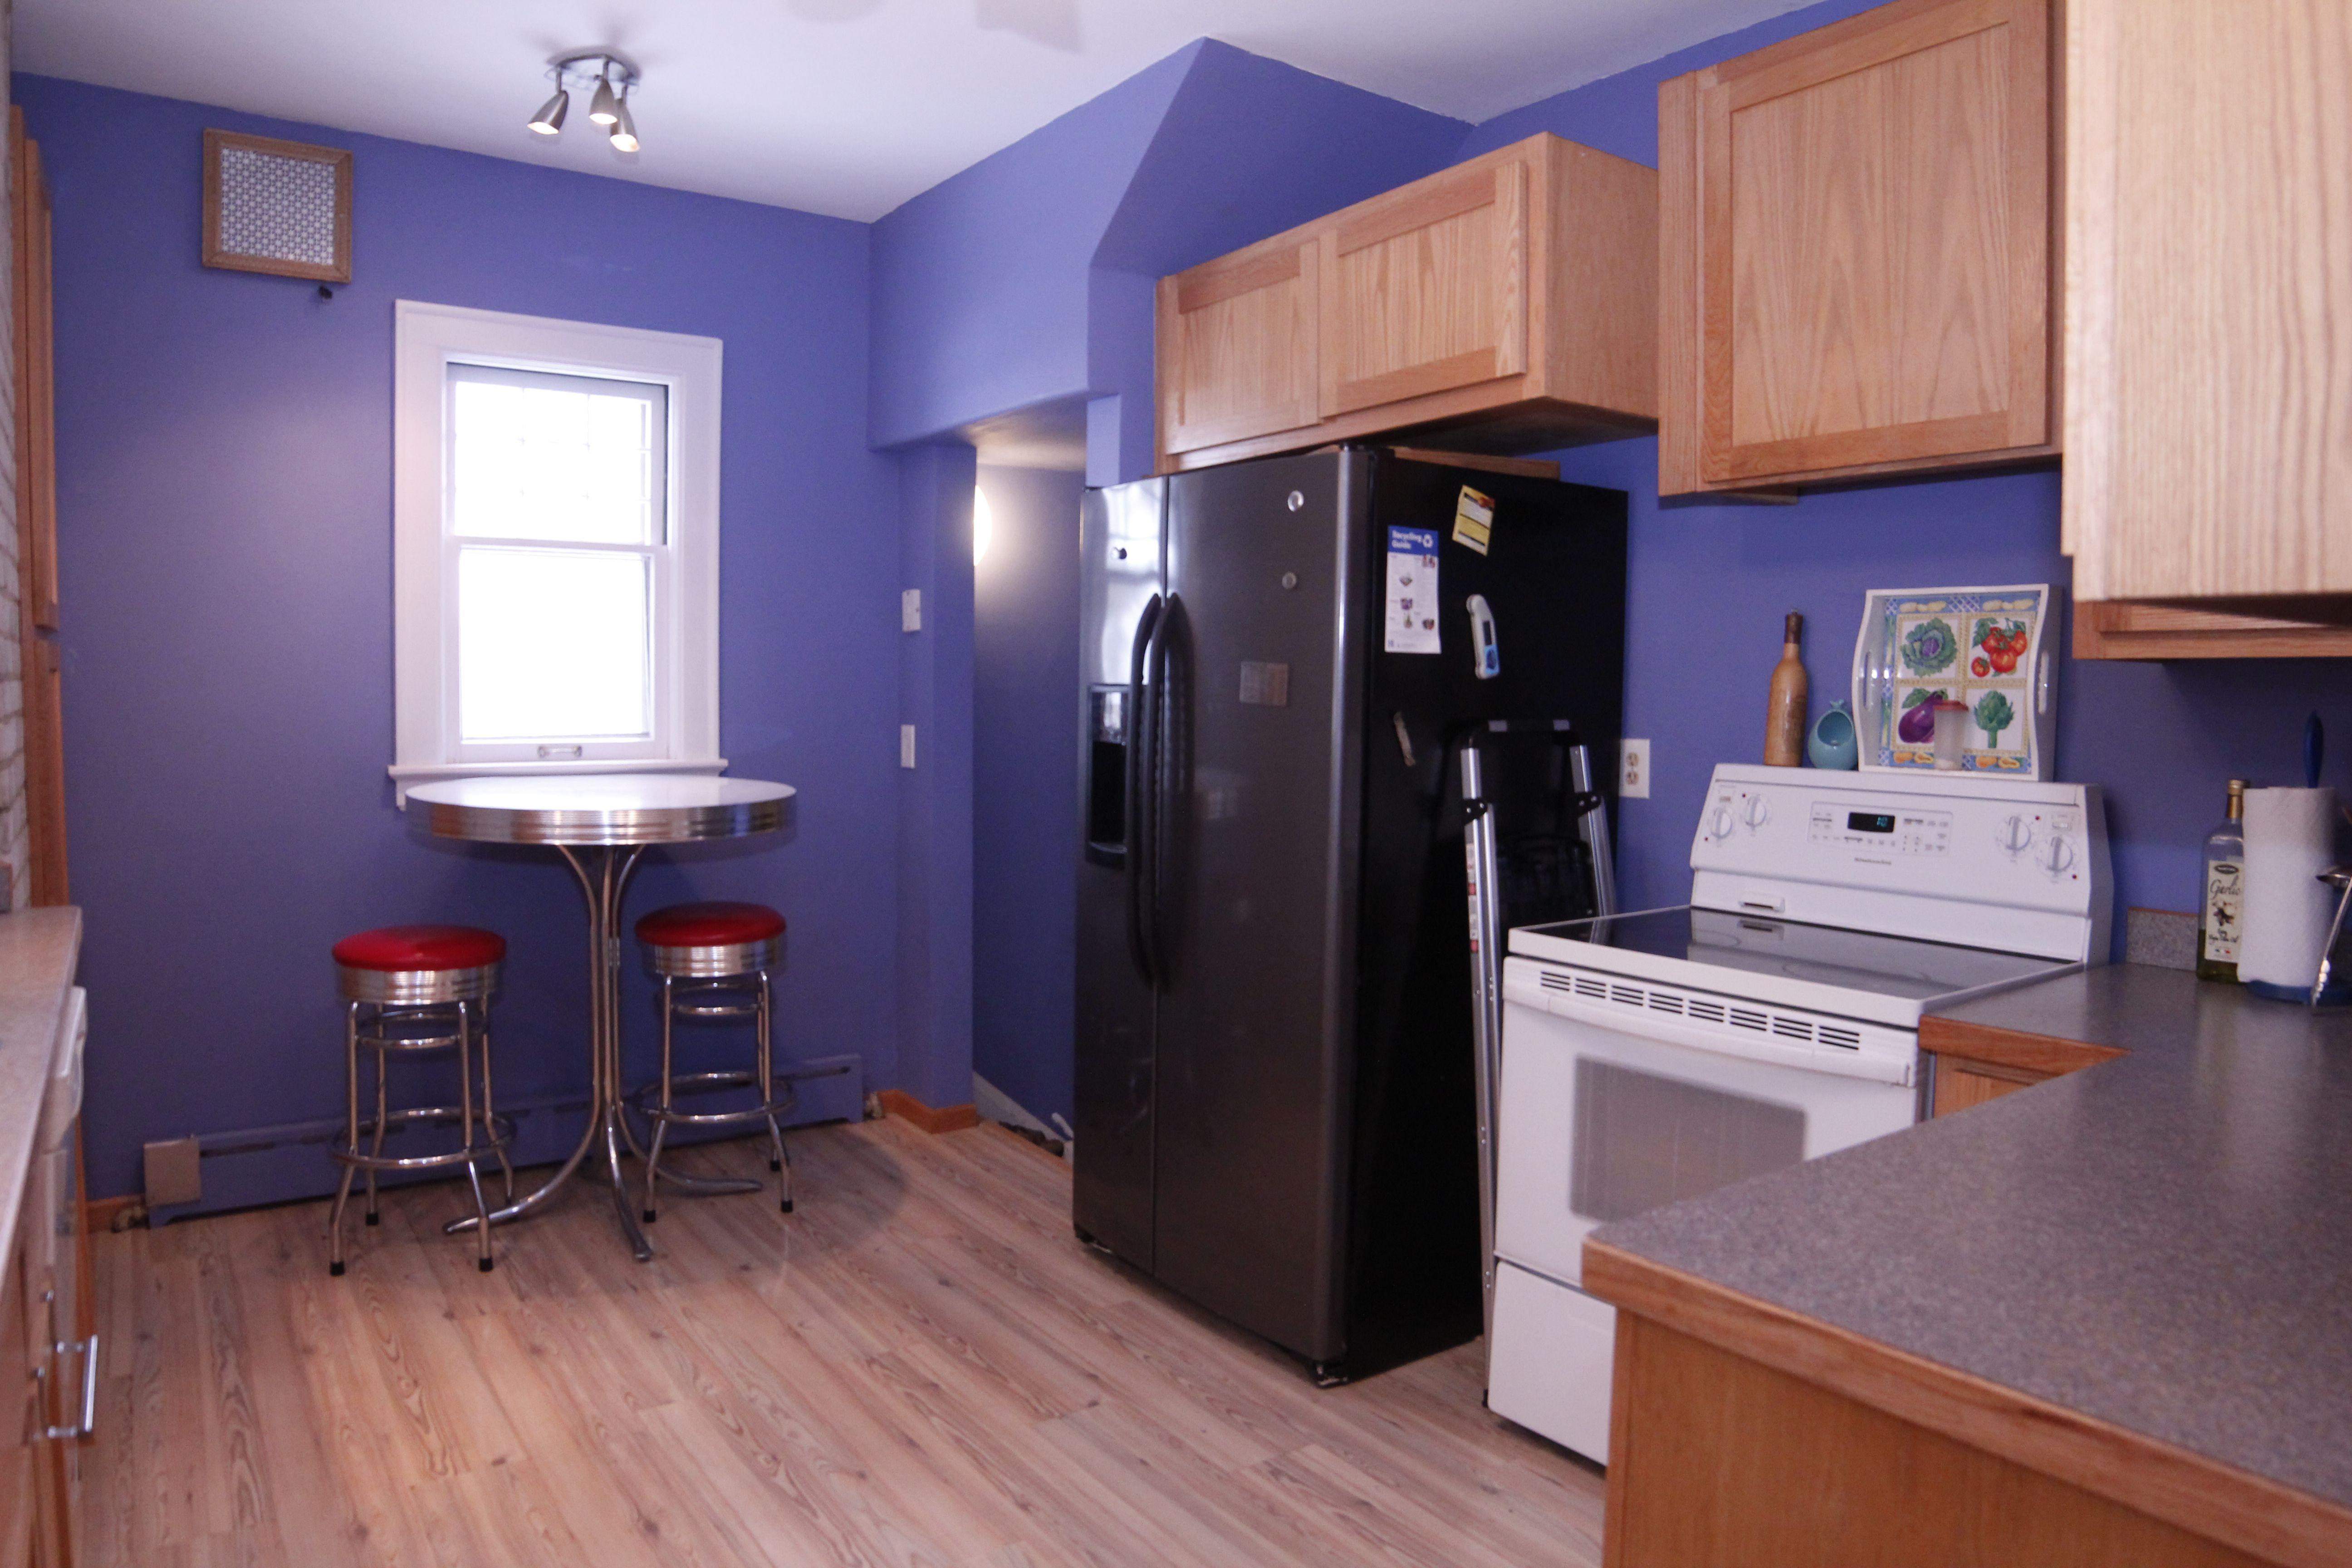 Appliances Minneapolis A Modern Kitchen Includes Updated Appliances Abundant Cupboard